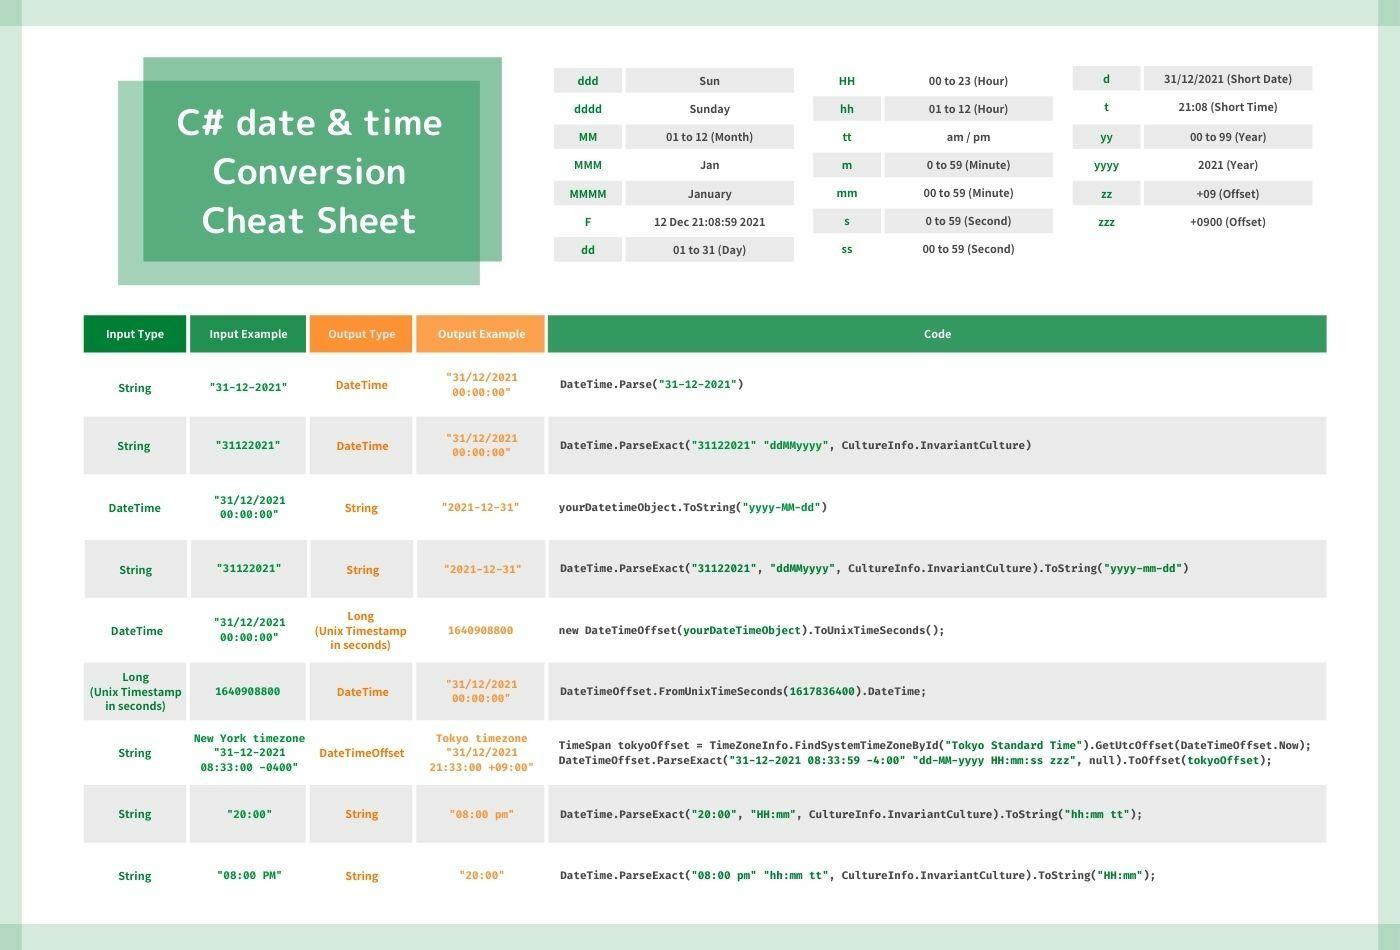 C sharp datetime conversion cheat sheet